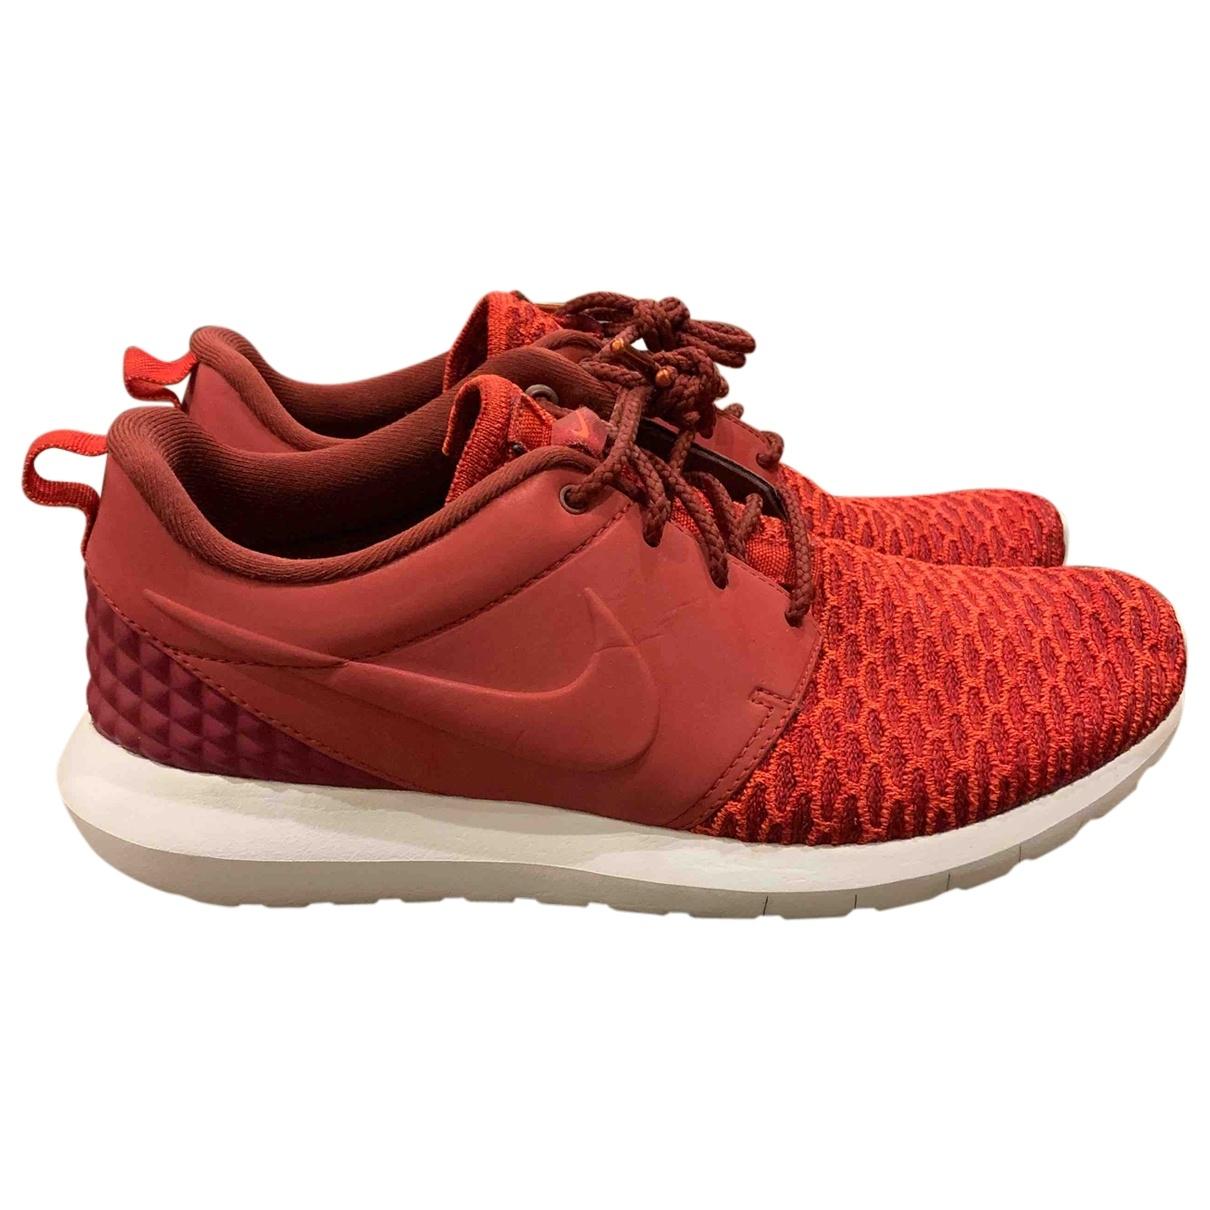 Nike - Baskets Roshe Run pour homme en toile - turquoise